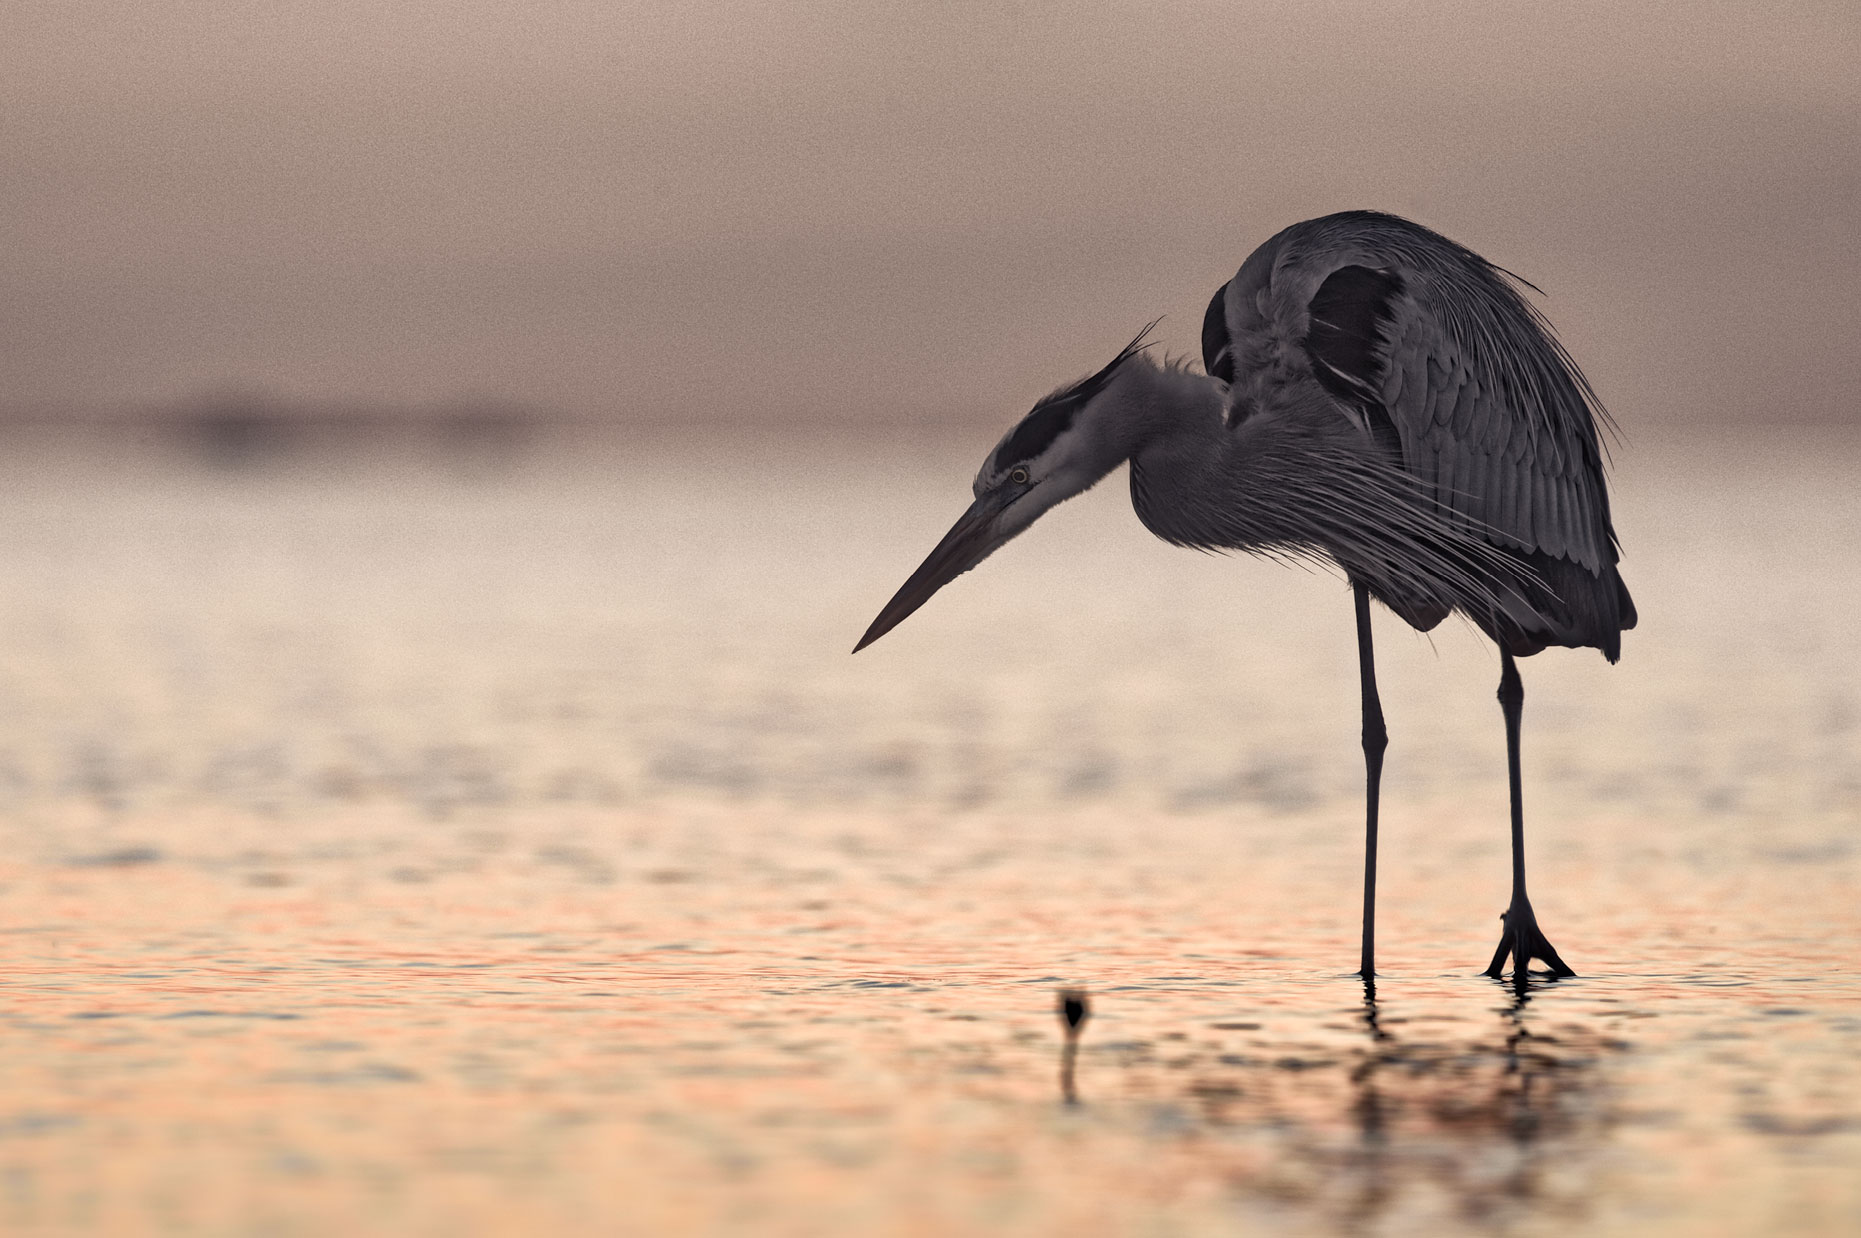 FritzImages   Travel and Outdoor Digital Images   image name = FIF FMA Desoto Grey Heron web1860 iop